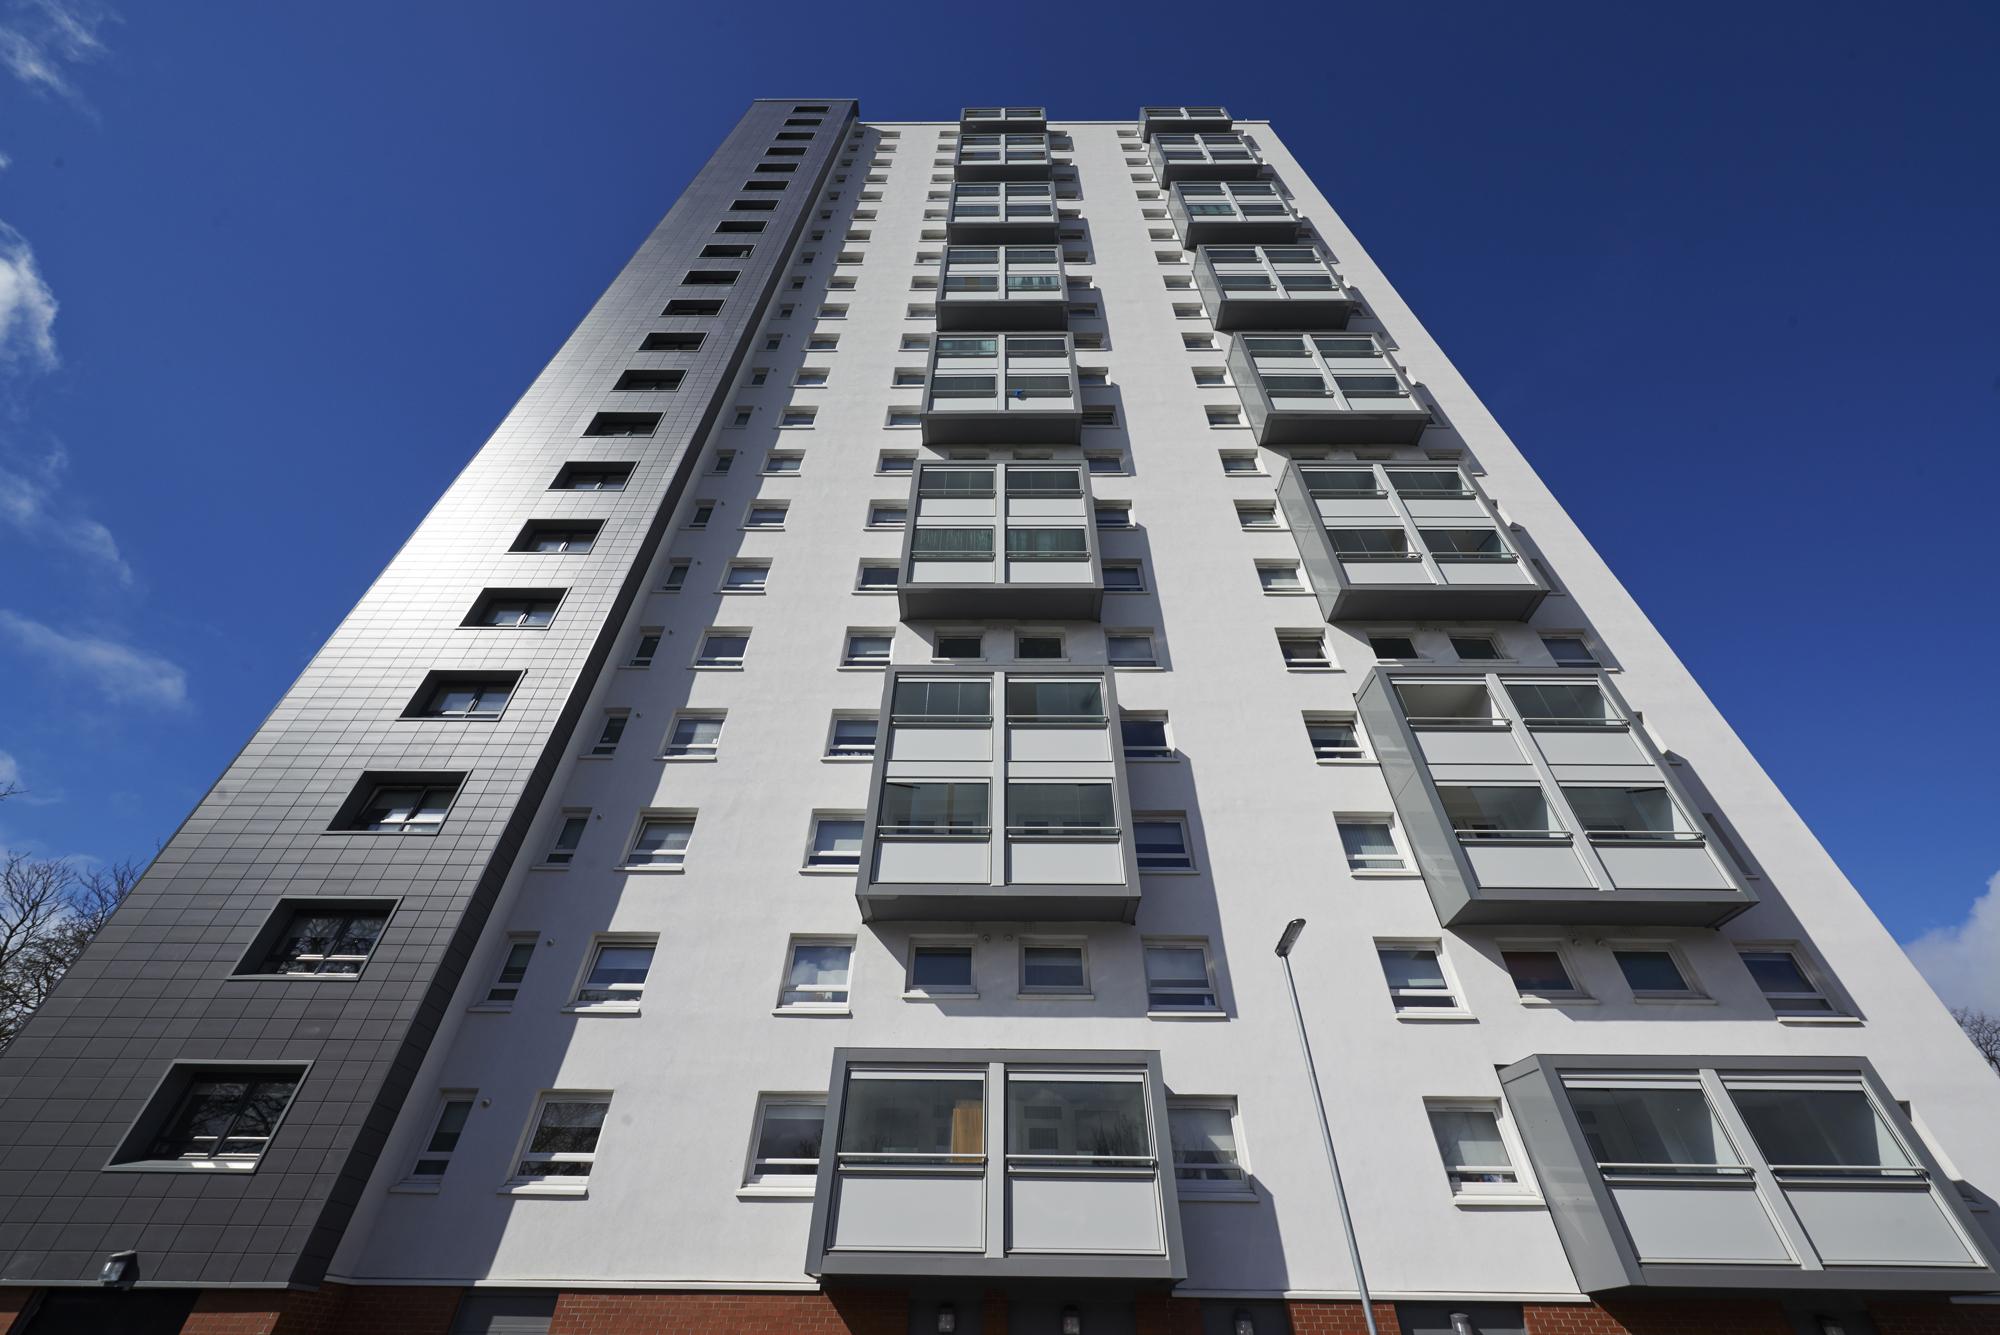 The benefits of incorporating balcony enclosures in refurbishment programmes